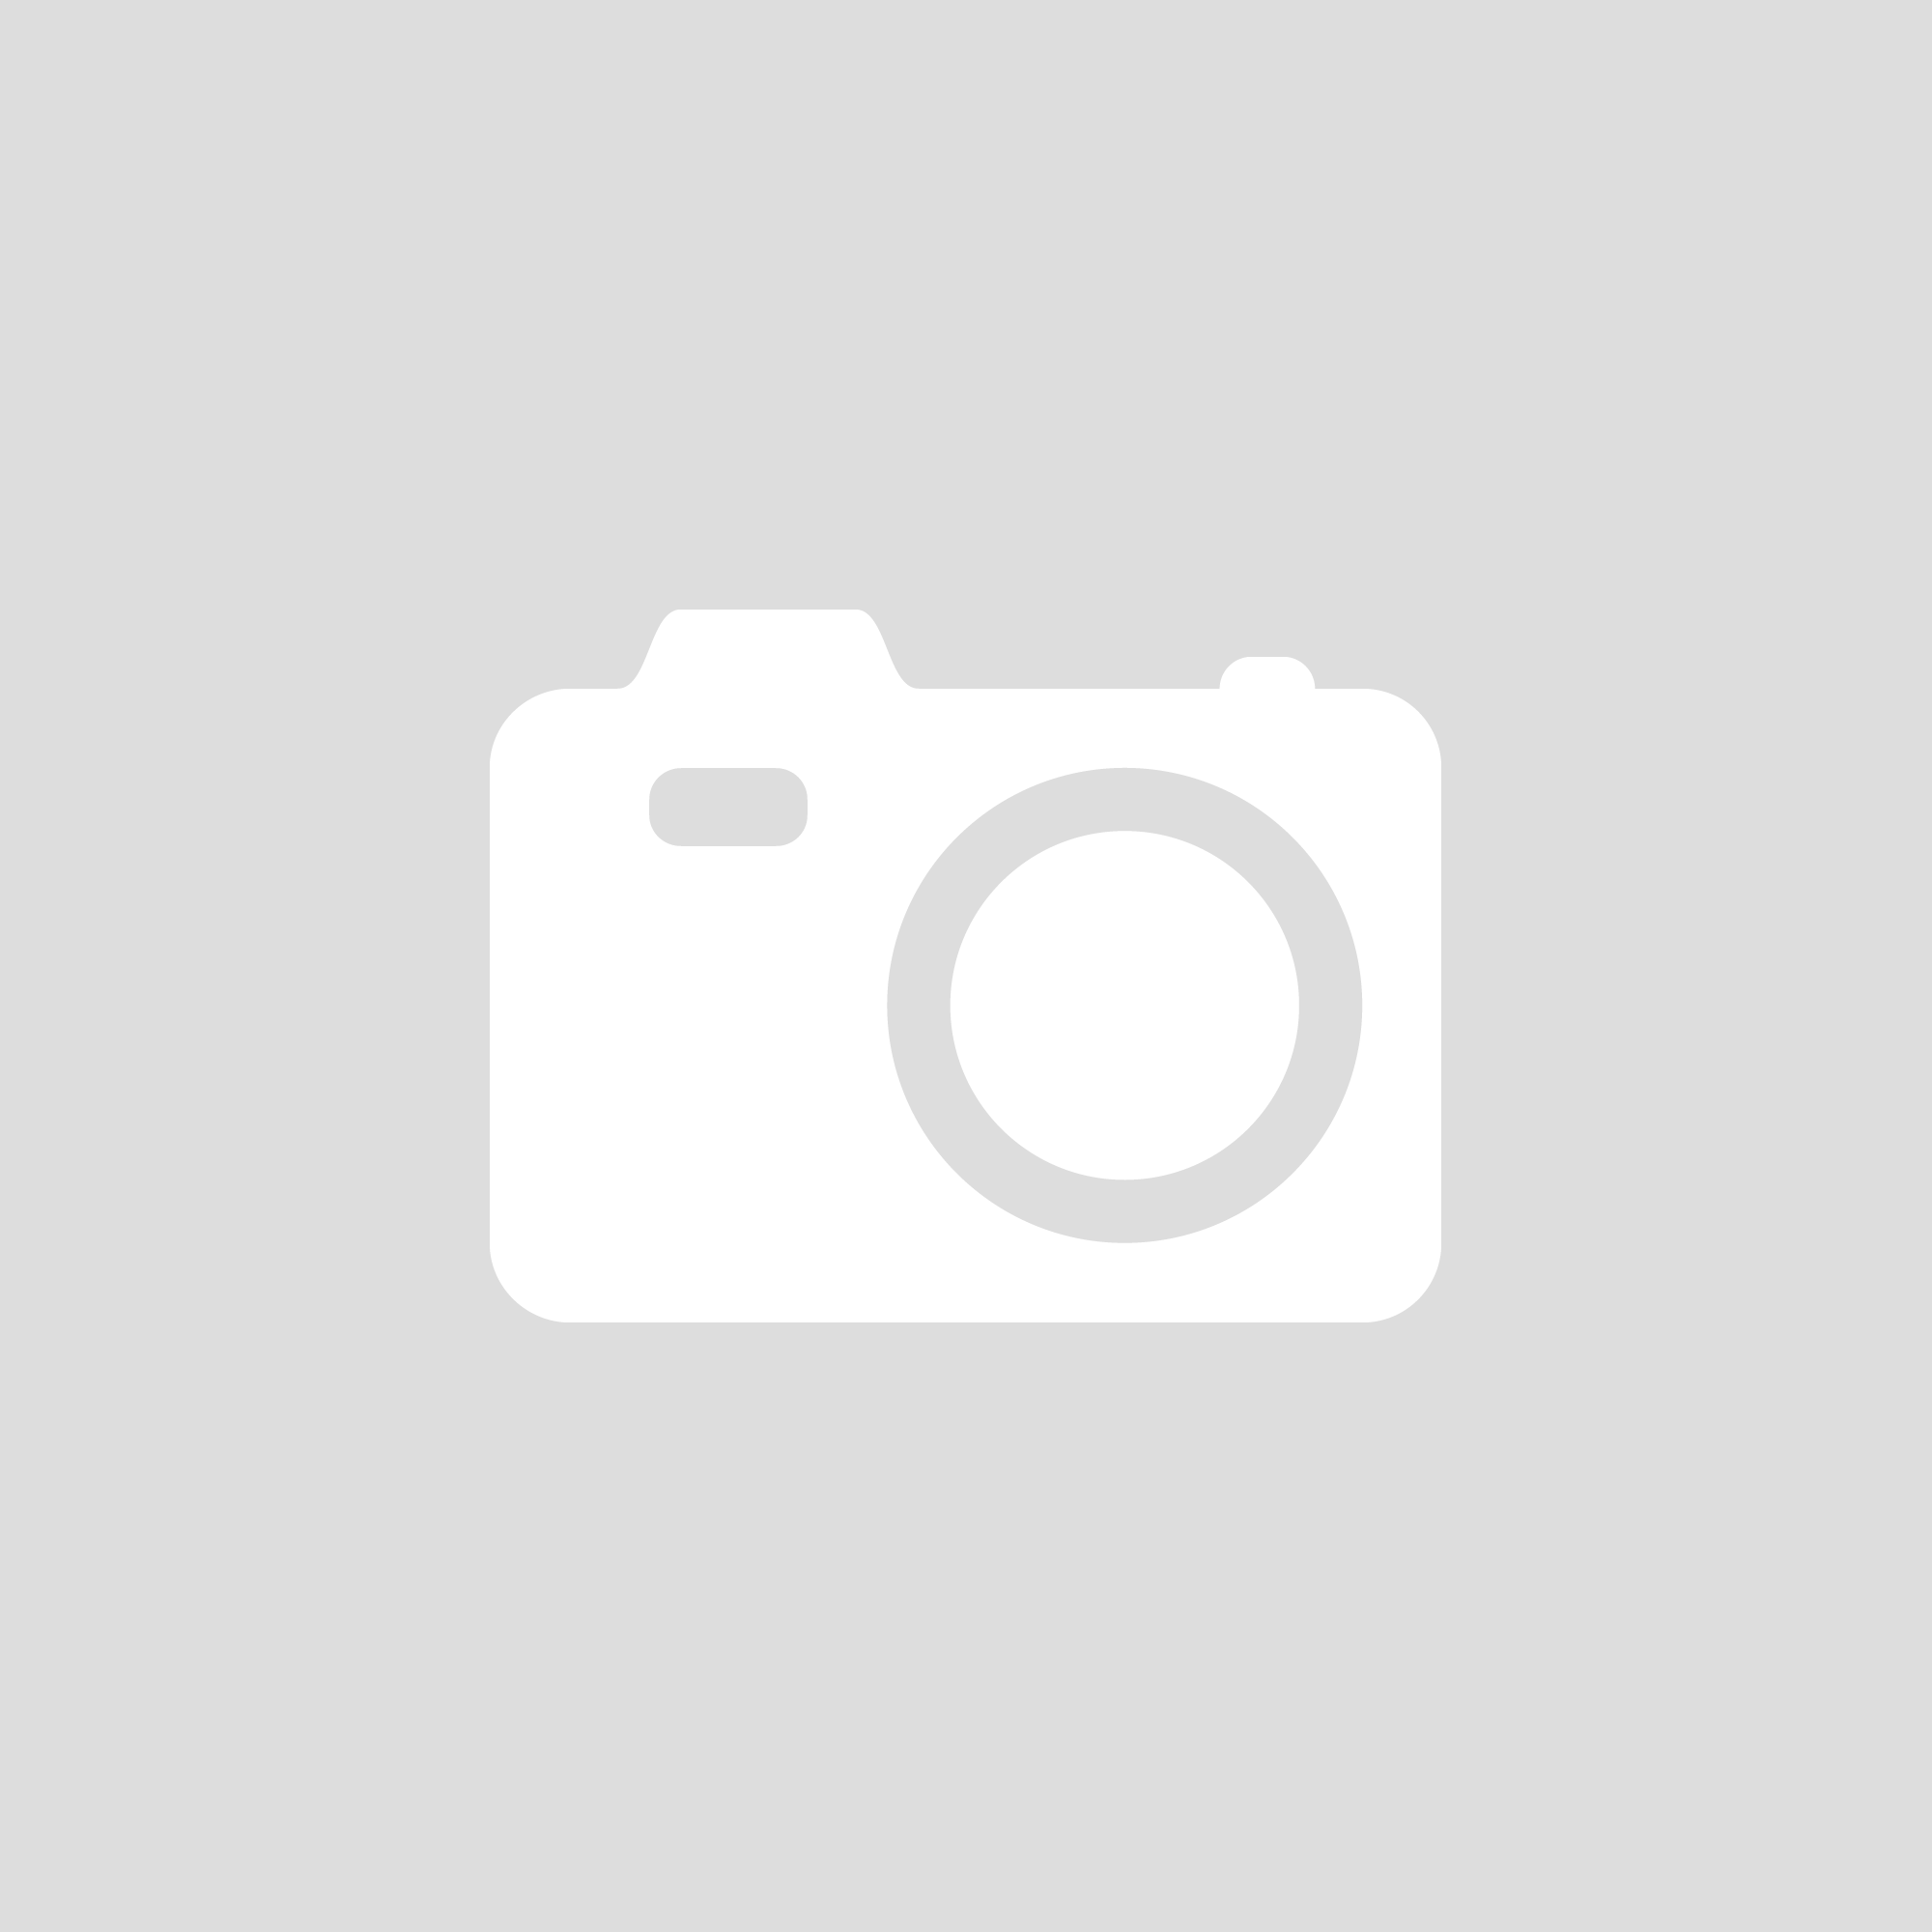 Enchanted Key Decoration Chrome Small by CIMC